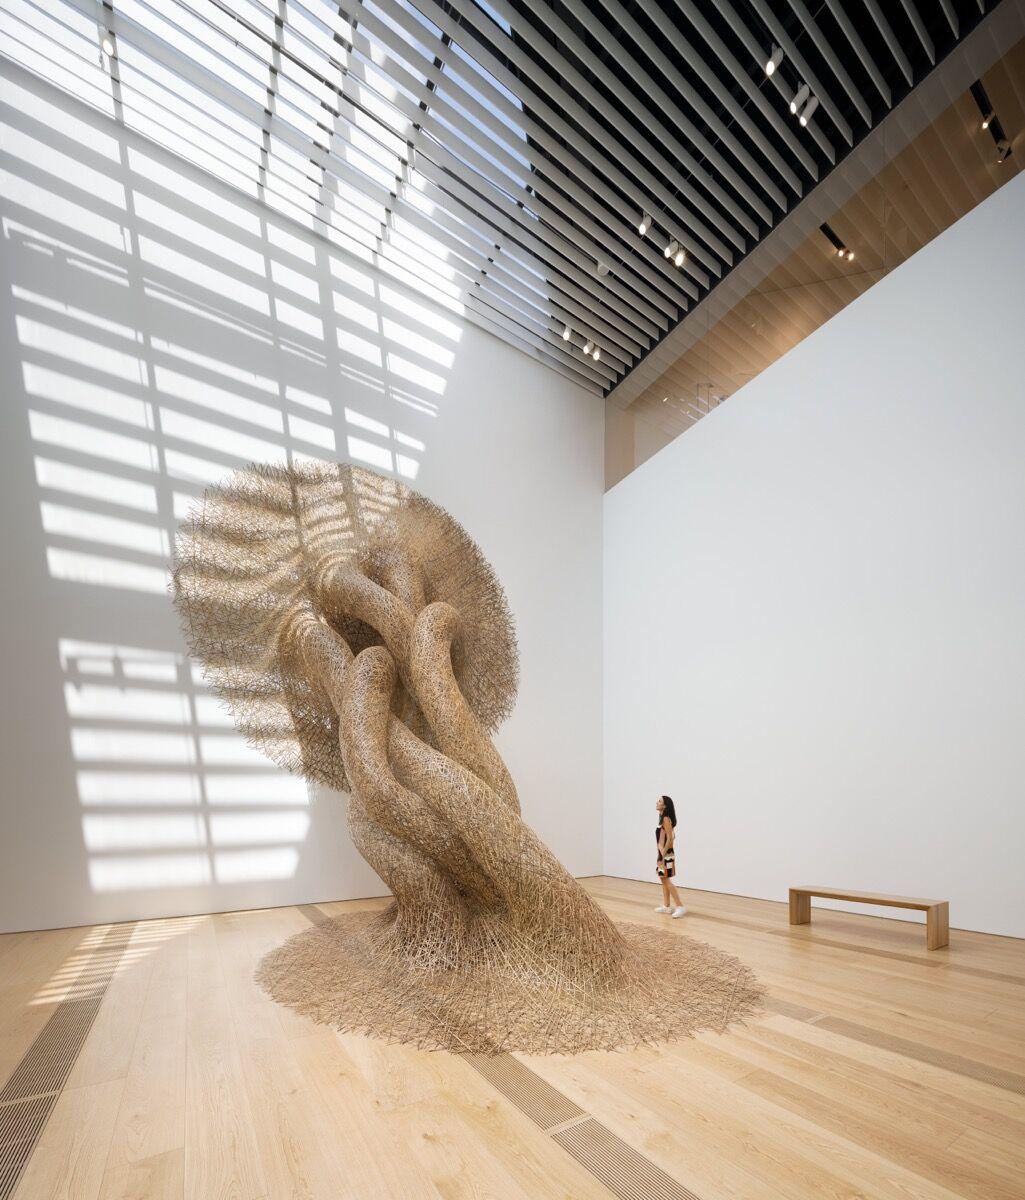 View of Tanabe Chikuunsai IV, bamboo installation, at OMM. Photo by Kengo Kuma and Associates. ©NAARO. Courtesy of the Odunpazari Modern Museum (OMM).